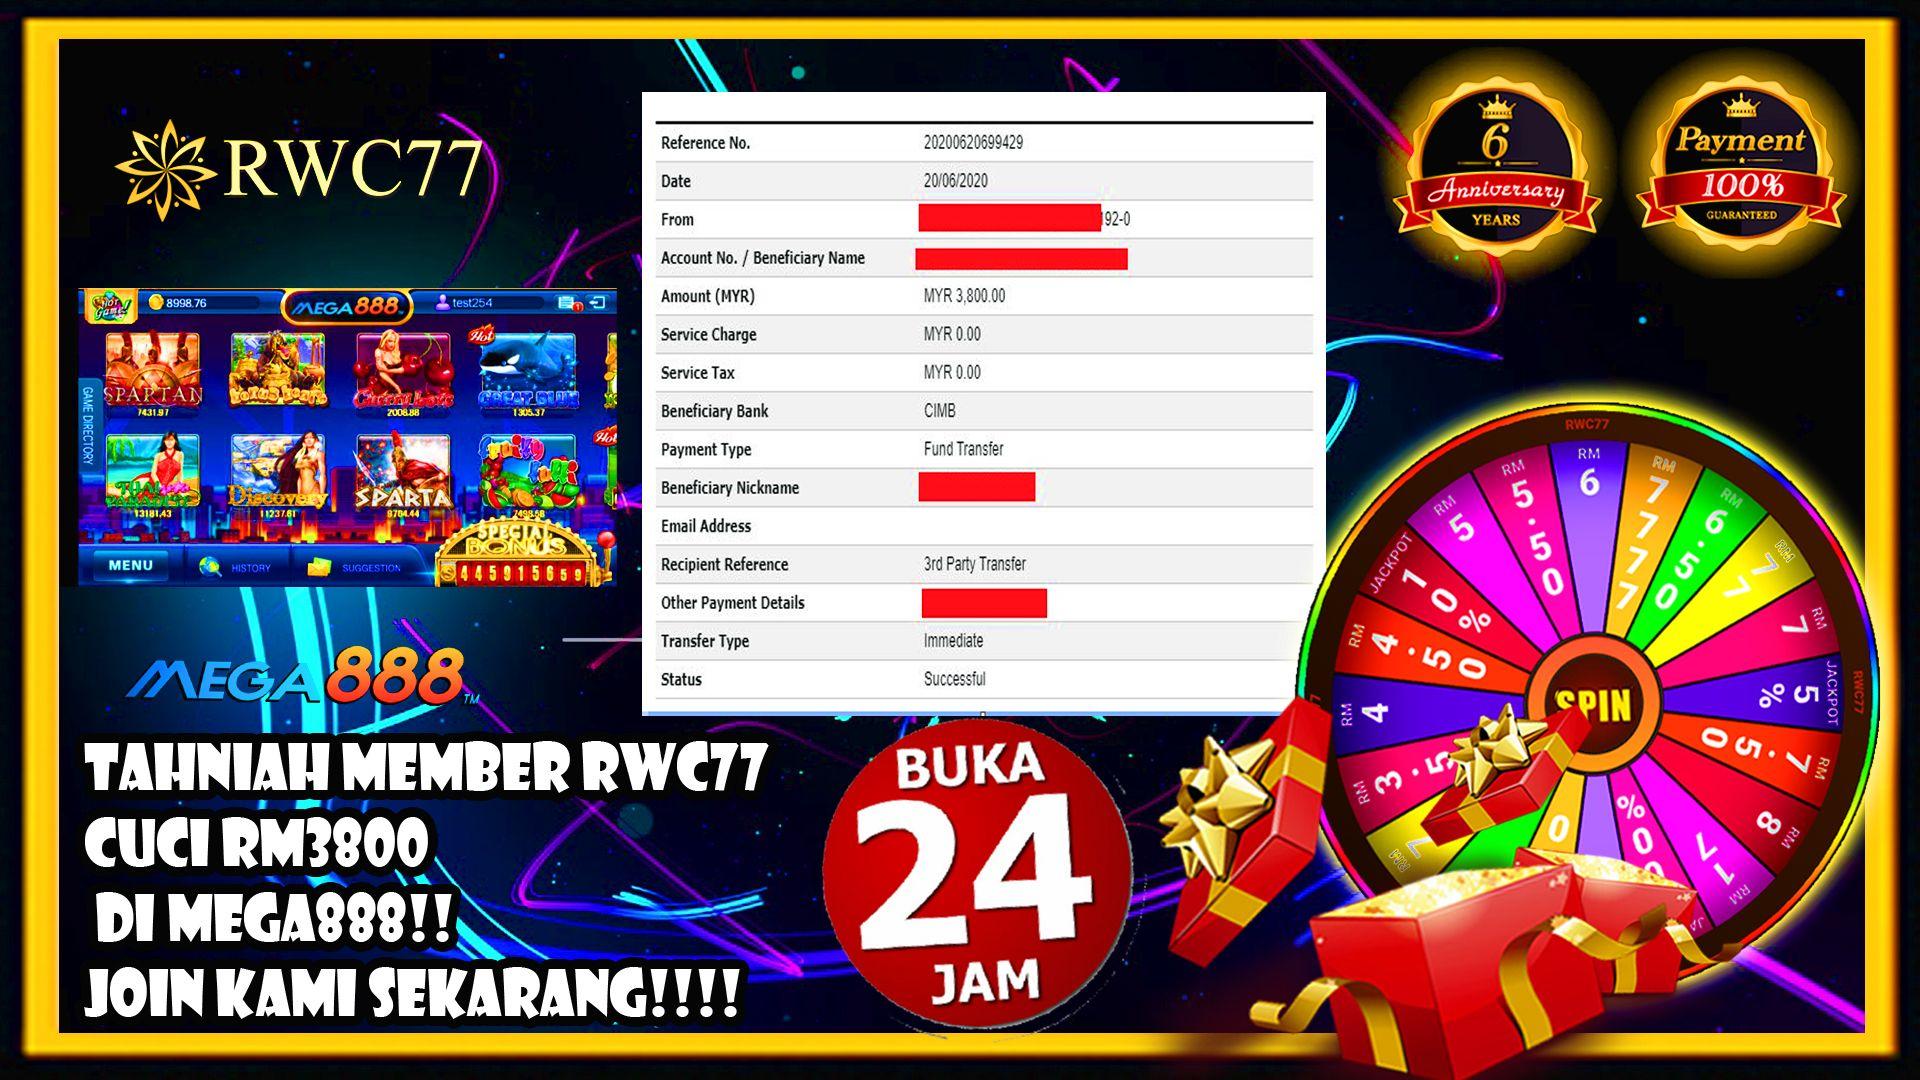 Tahniah Member Cuci RM 3800 dalam MEGA 888 !!! JOIN US NOW !!!